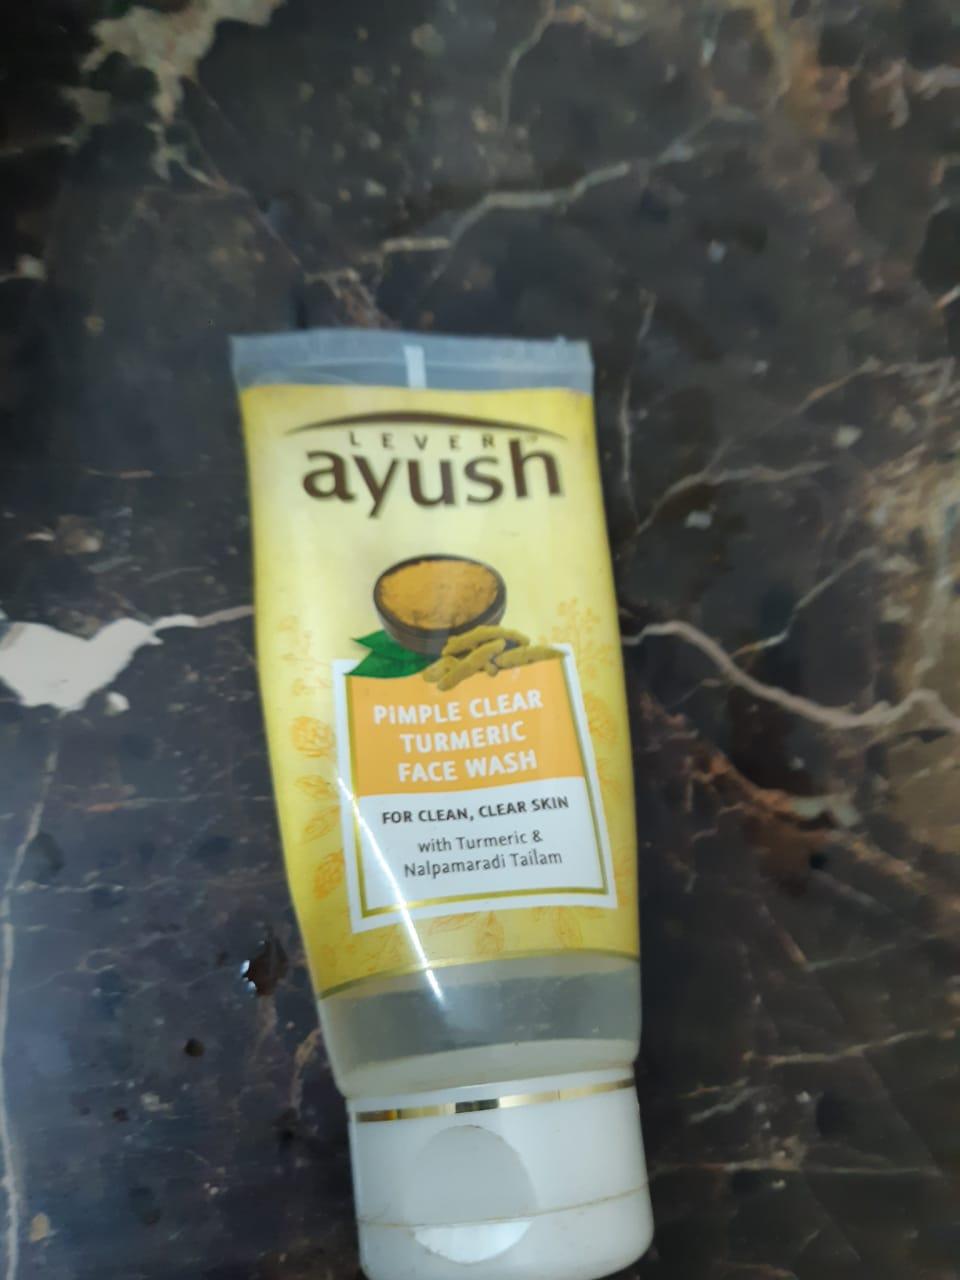 Lever Ayush Anti Pimple Turmeric Face Wash-Turmeric keeps pimples away!-By poonam_kakkar